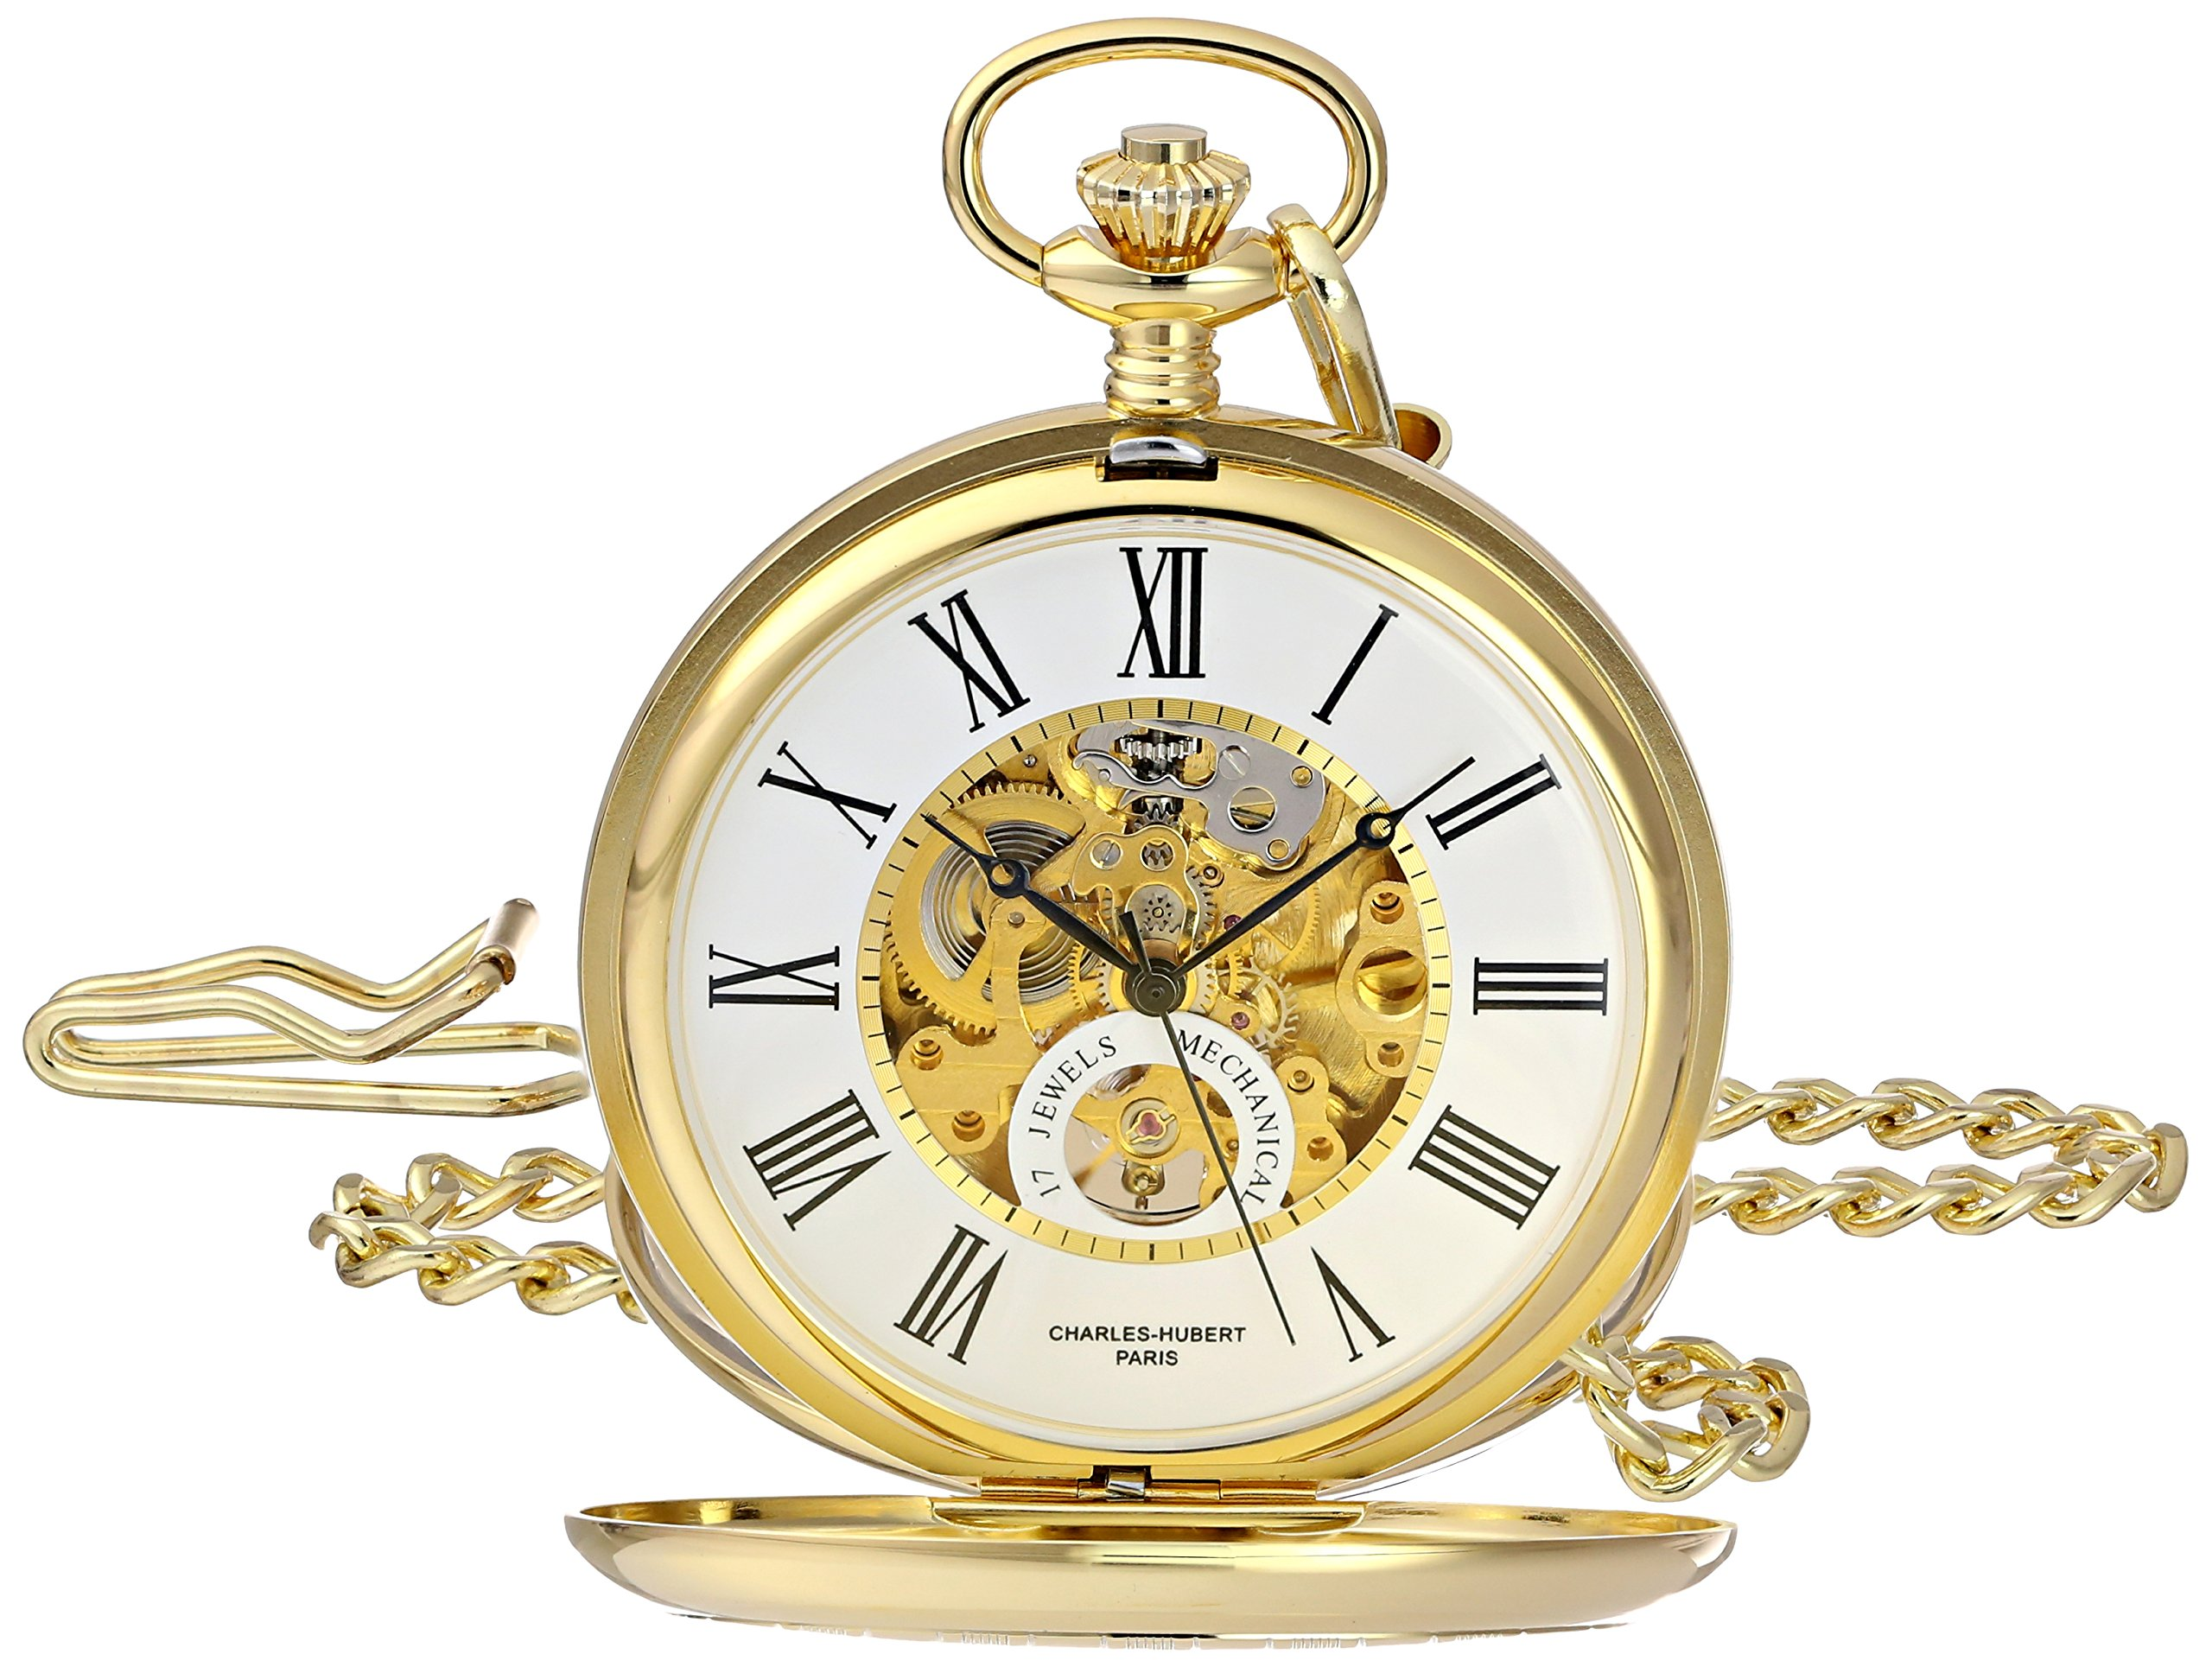 Charles-Hubert, Paris 3973-G Classic Collection Analog Display Mechanical Hand Wind Pocket Watch